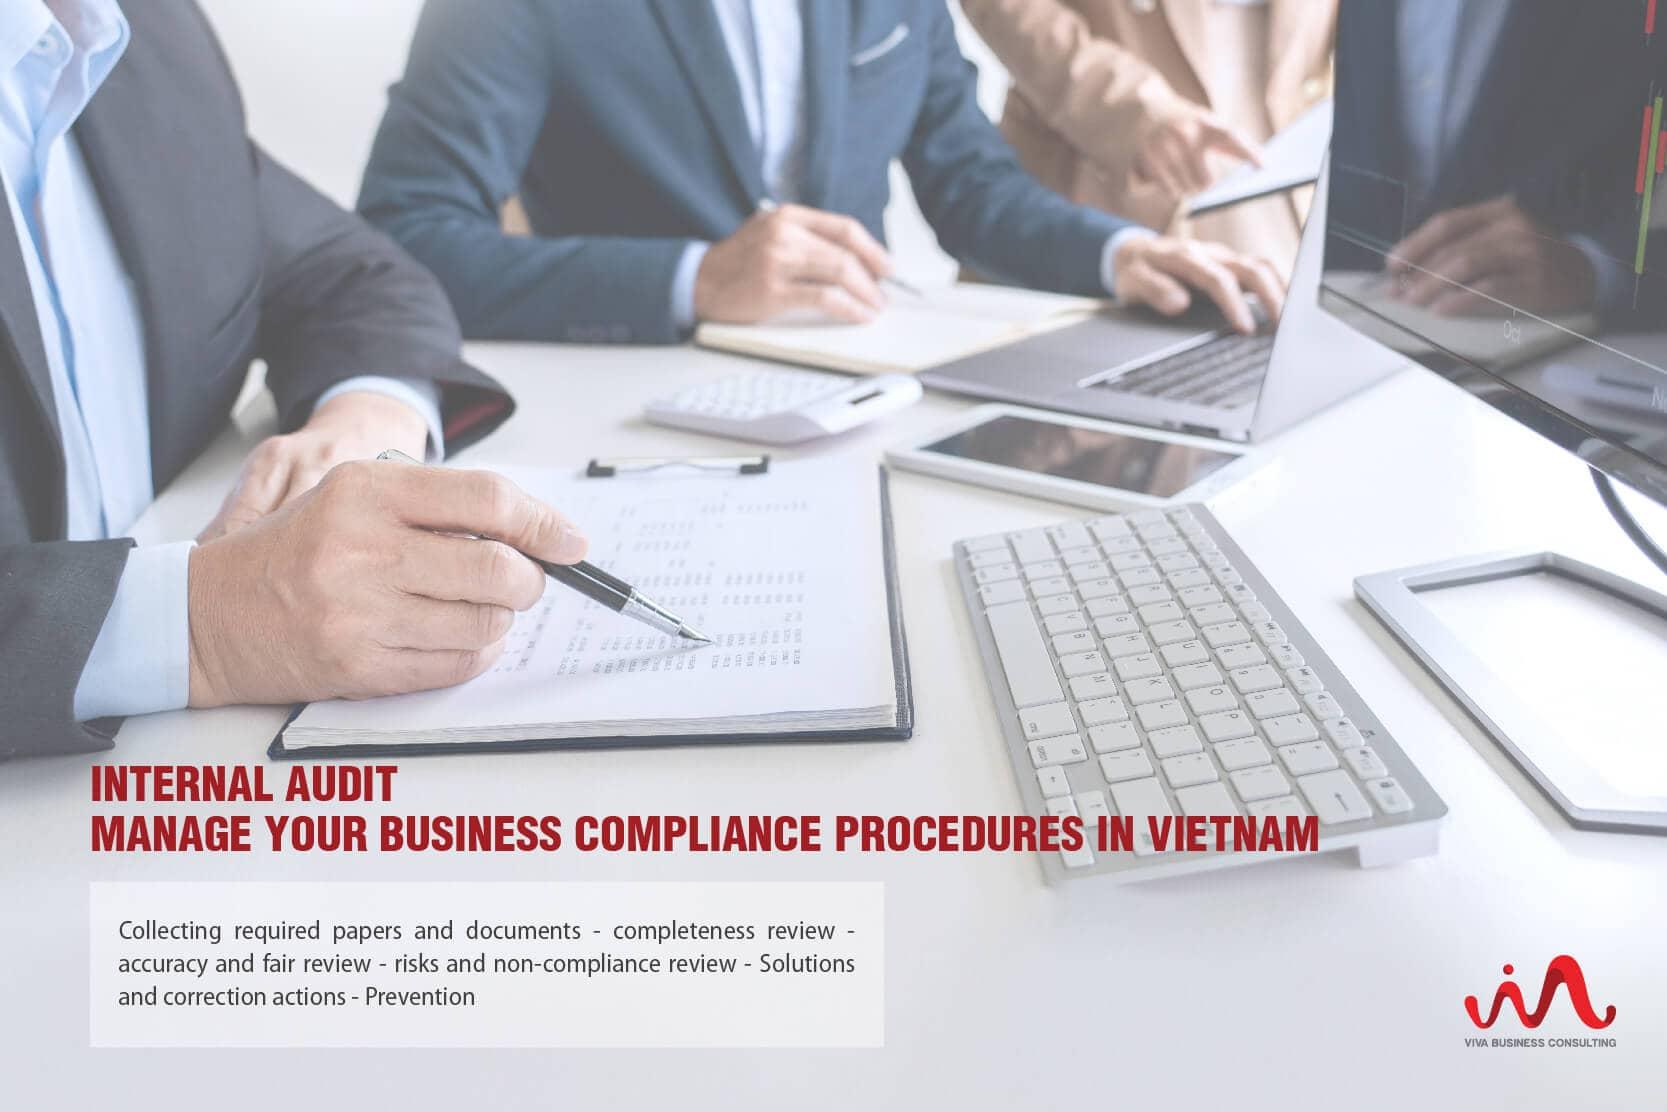 2019 Internal Audit Plan - Compliance - Tax - Accounting - HR